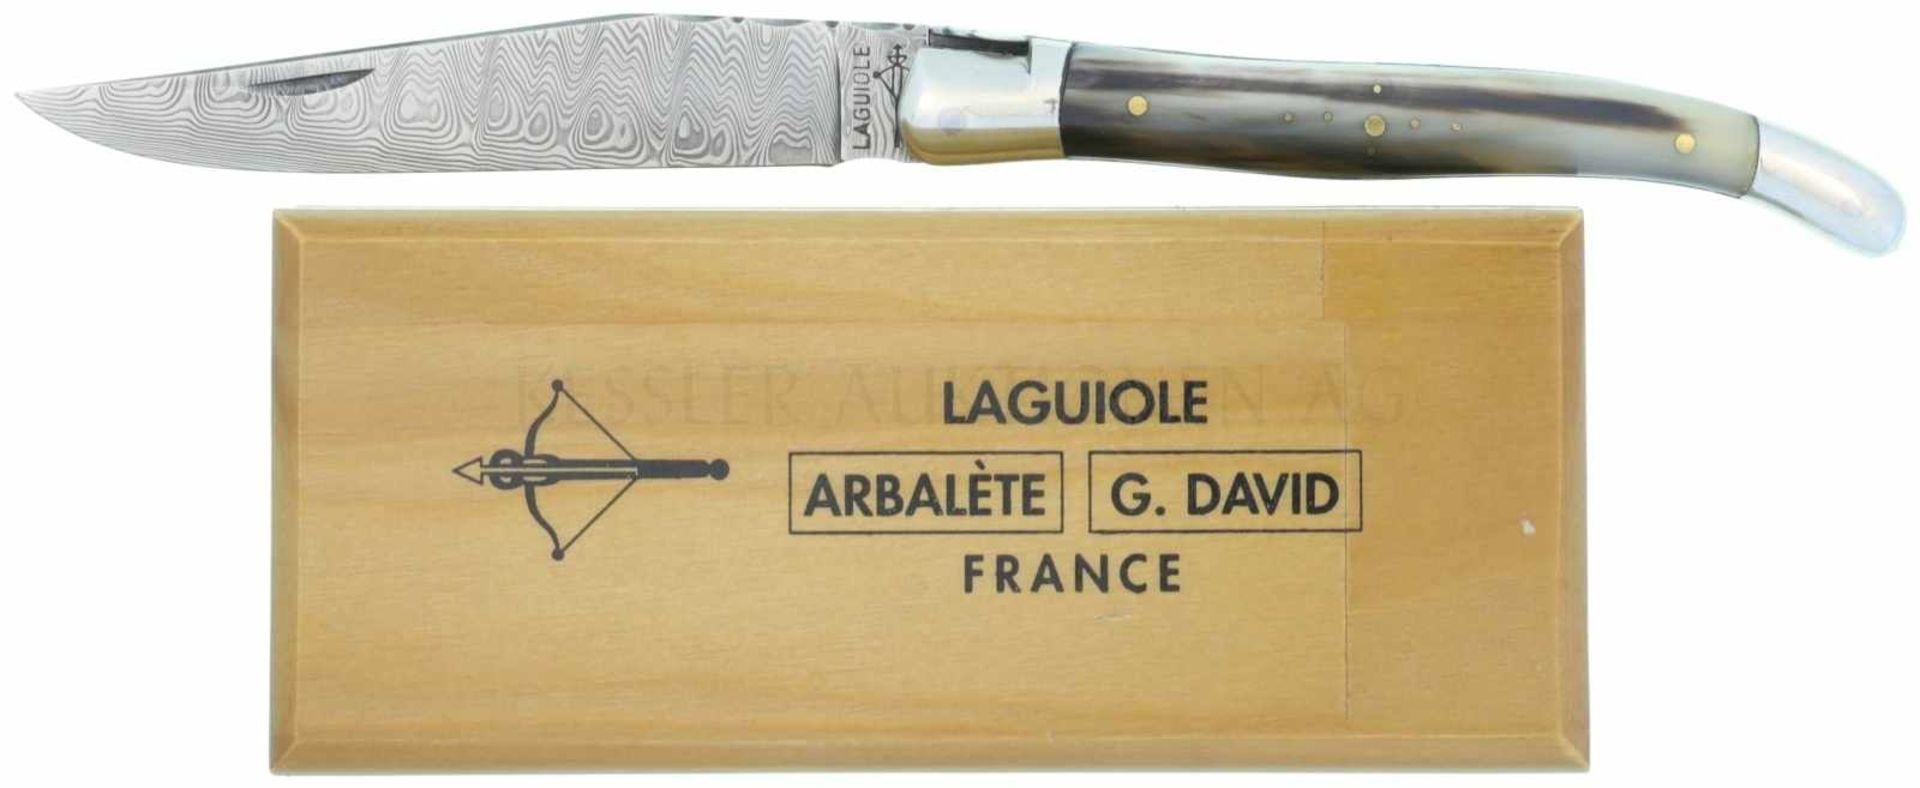 Los 48 - Messer LaGuiole, G.David L'Arbalete, Damast KL 102mm, TL 220mm, geschmiedete Damastklinge, an der